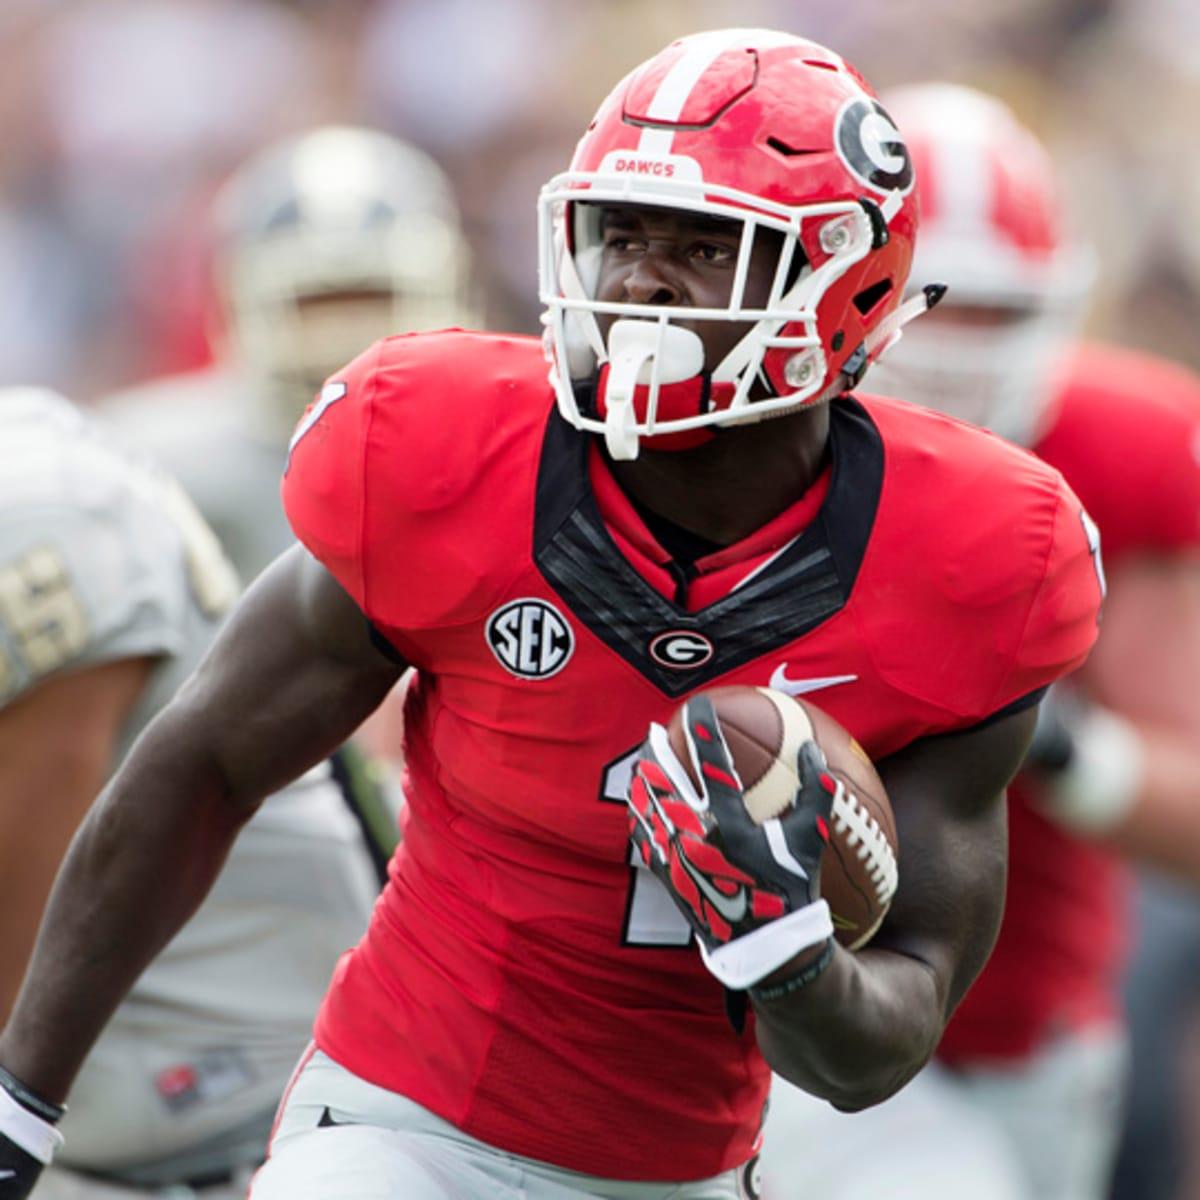 Georgia Bulldogs: Sony Michel has surgery on broken arm - Sports ...